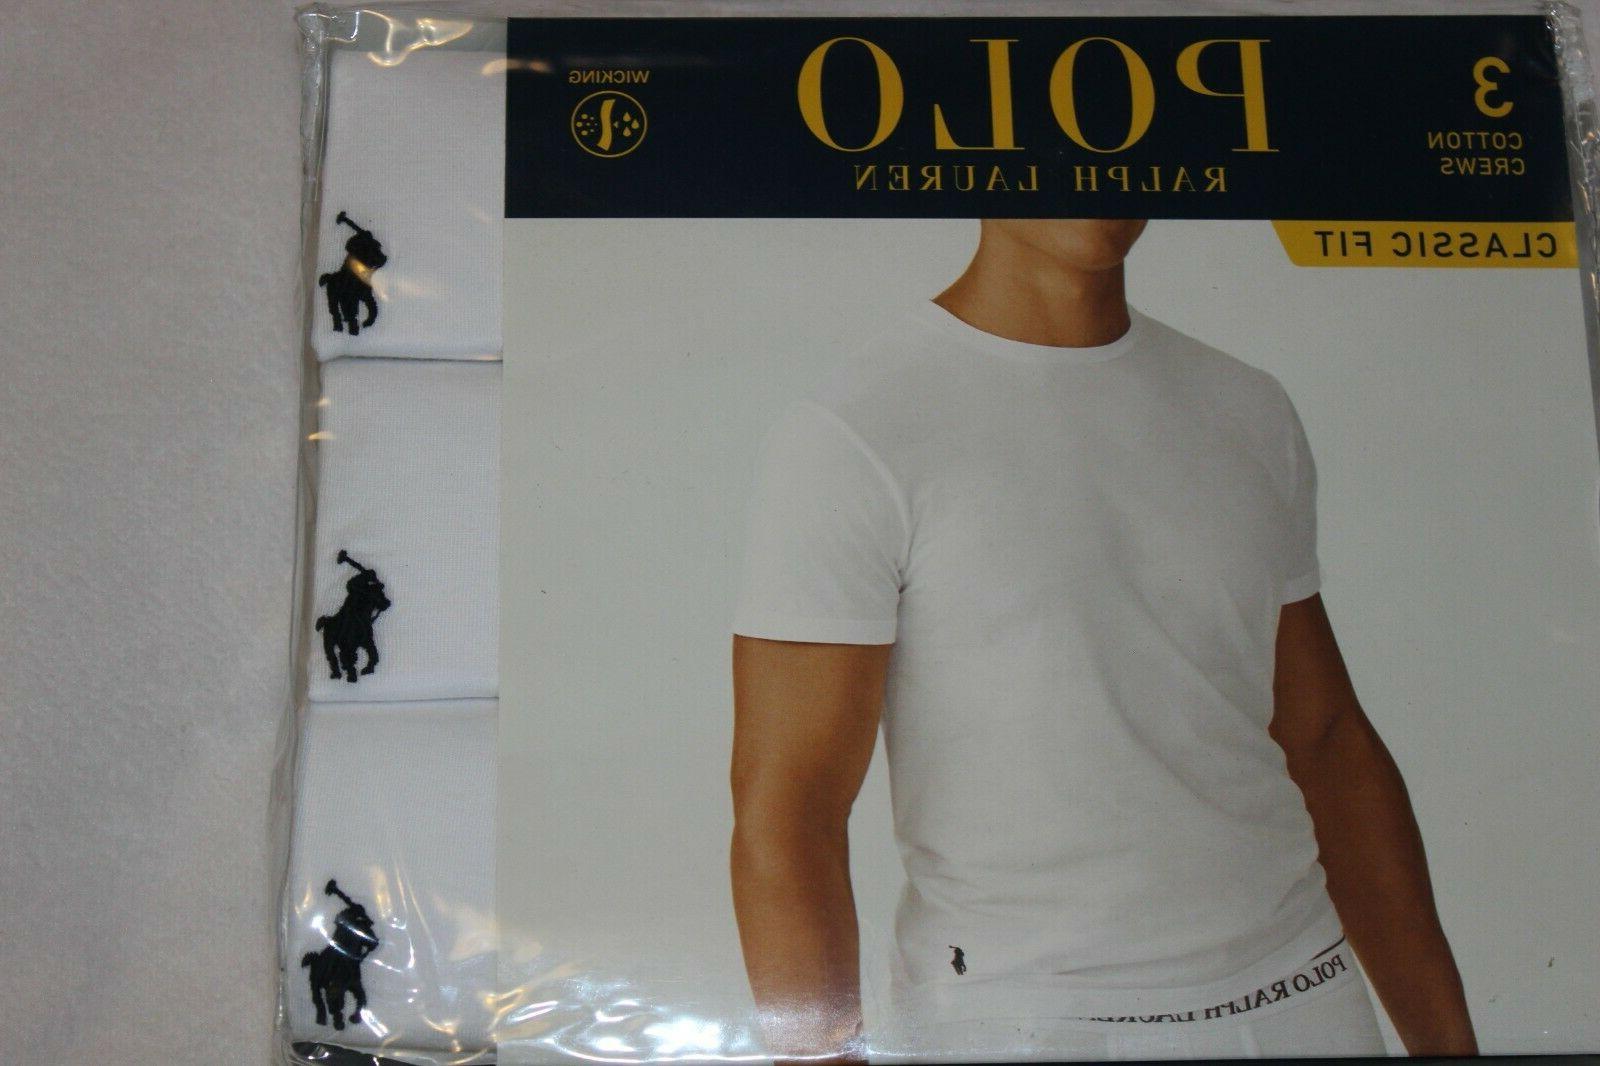 Polo White Cotton Crew 3-Pack Sizes S,M,L,XL